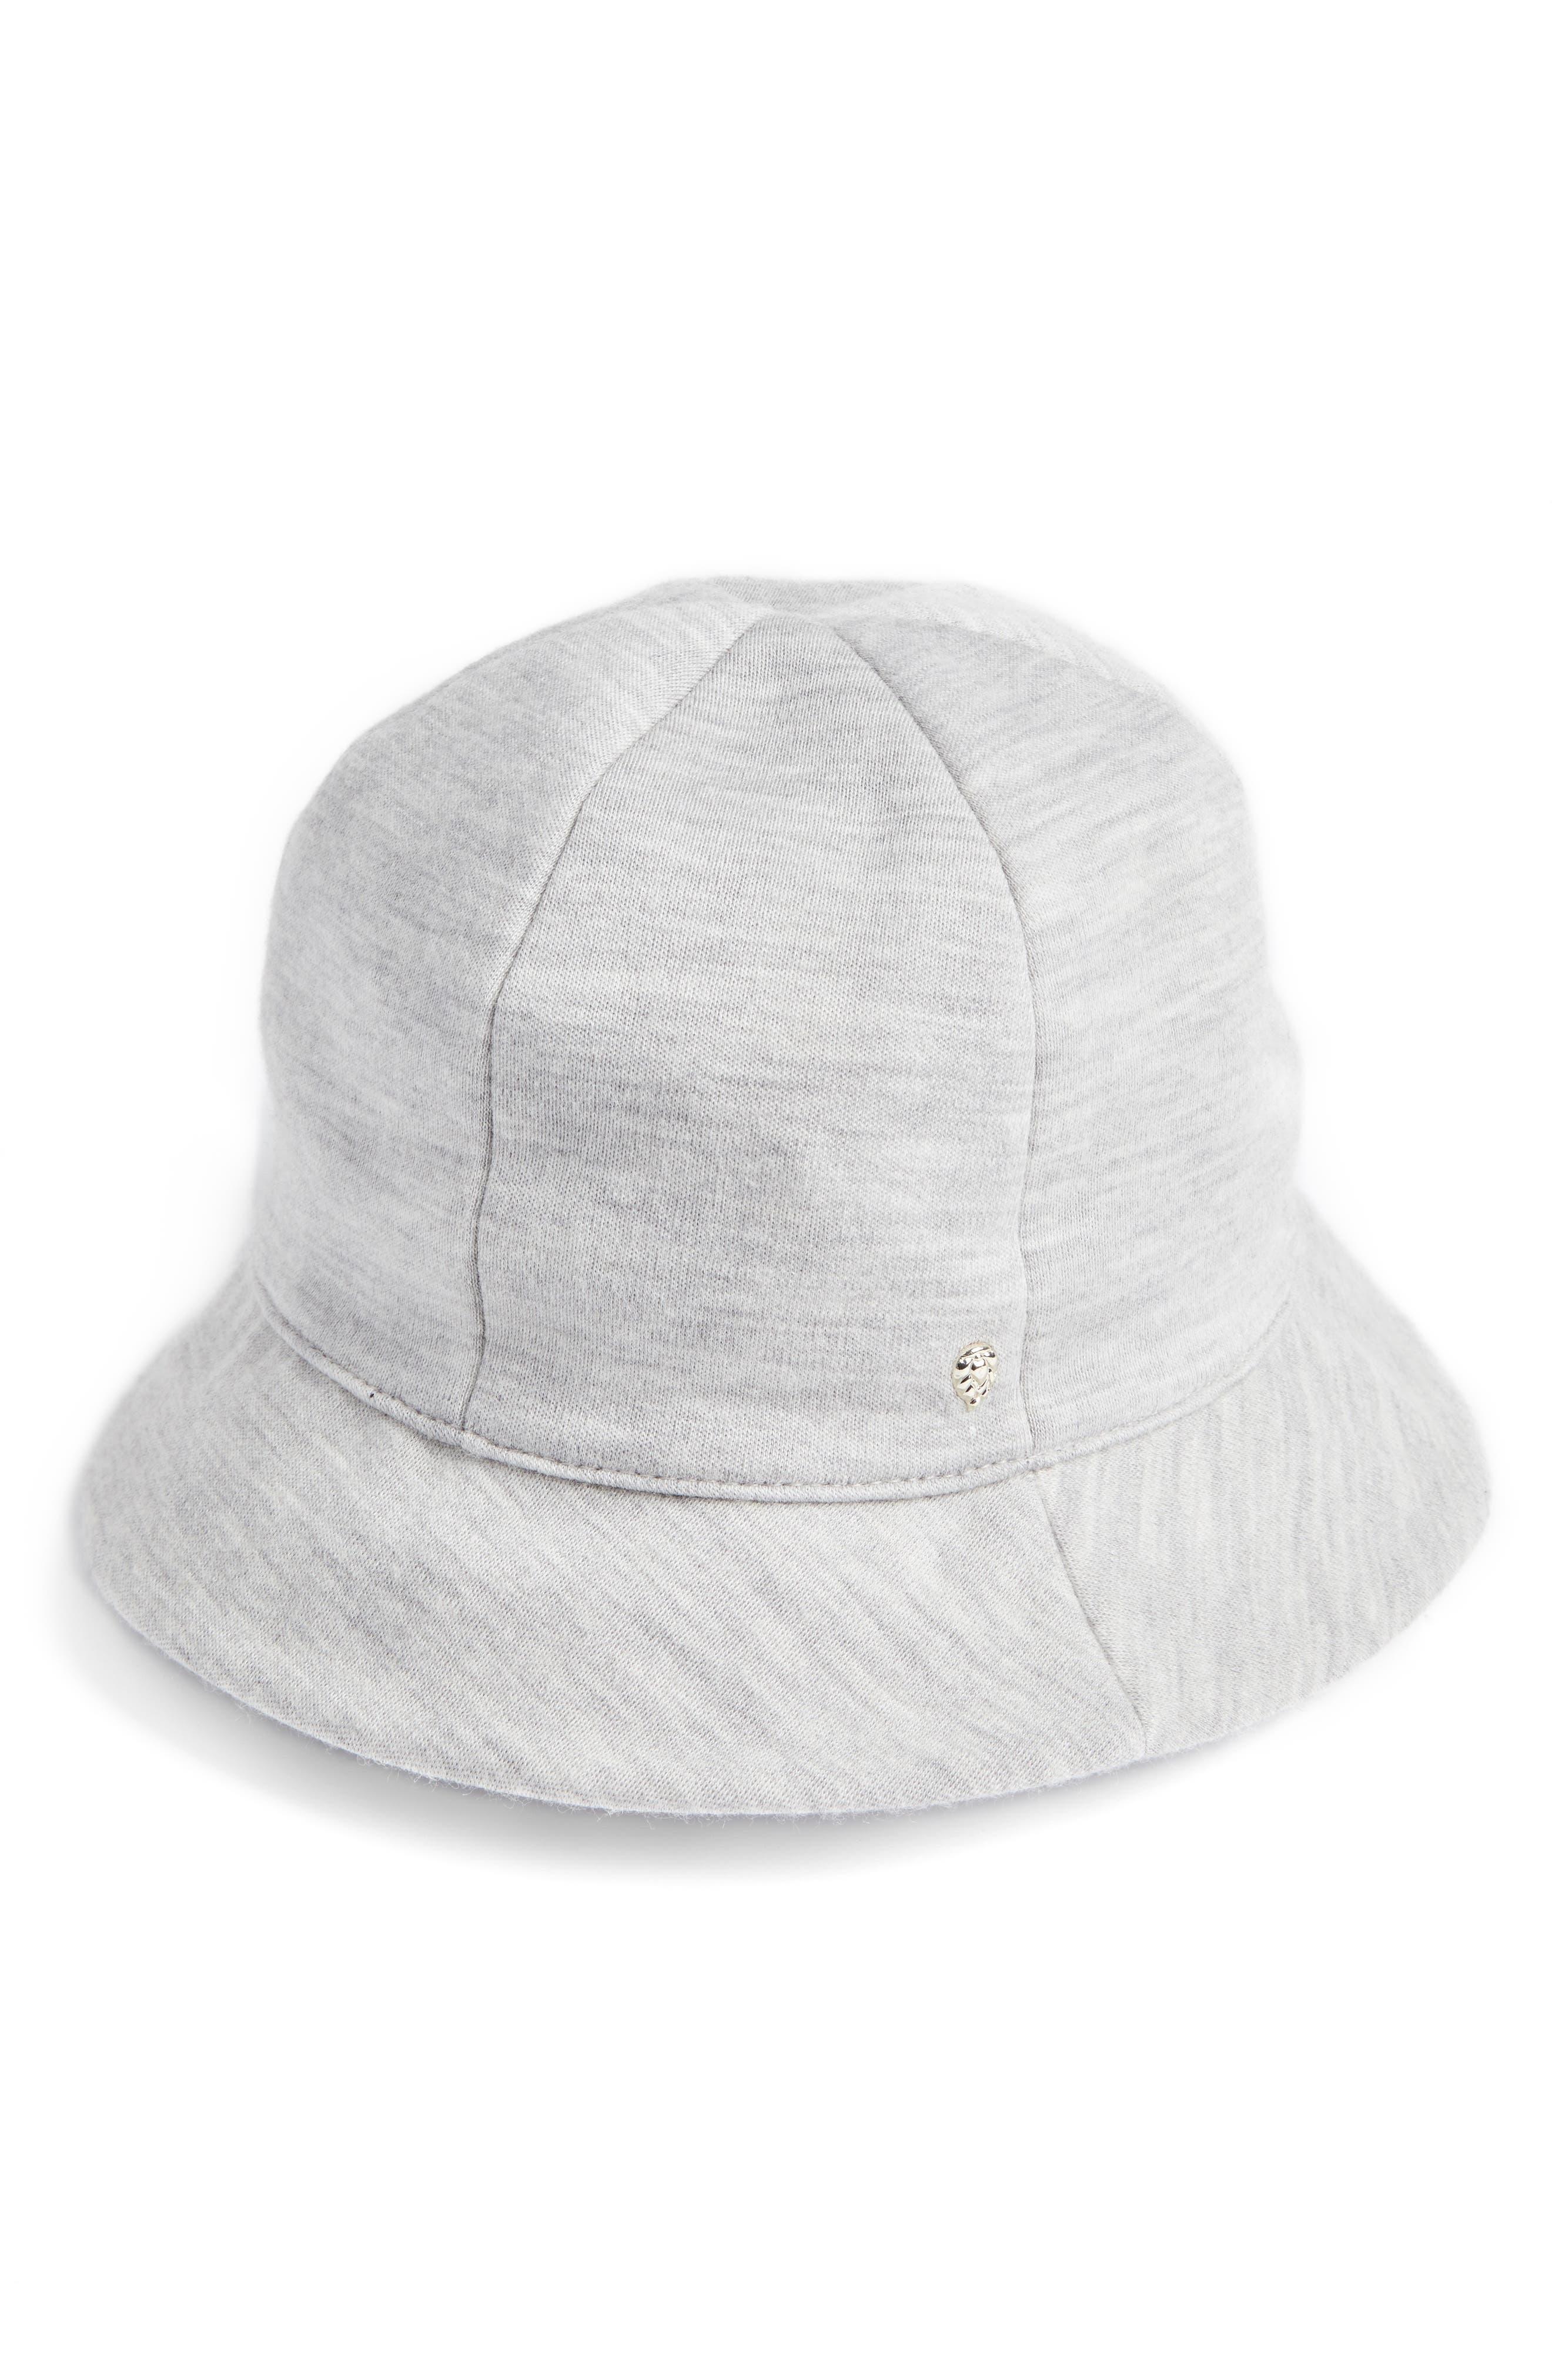 Main Image - Helen Kaminski Merino Wool Jersey Bucket Hat